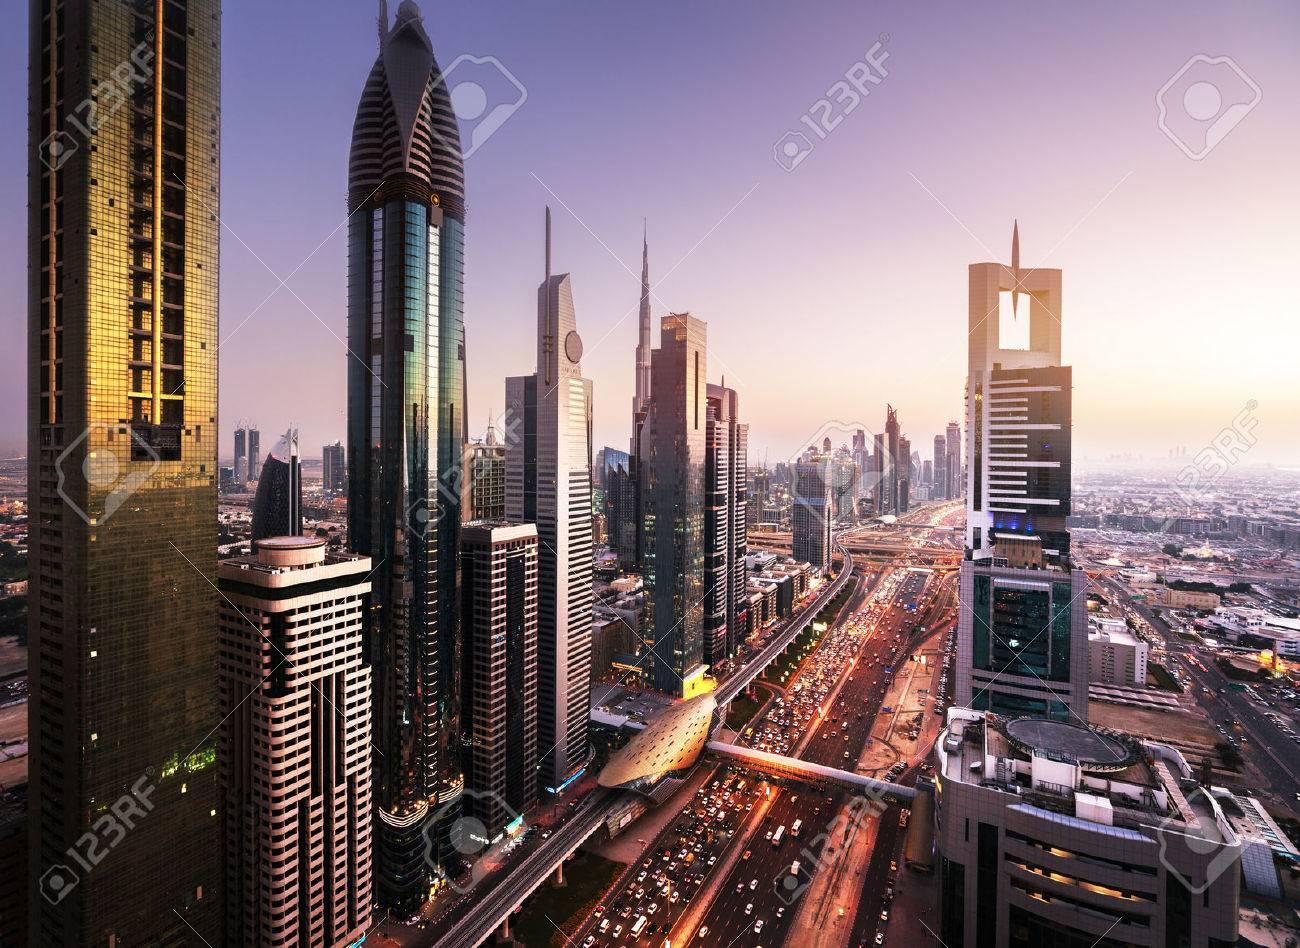 Dubai skyline in sunset time, United Arab Emirates - 55482317